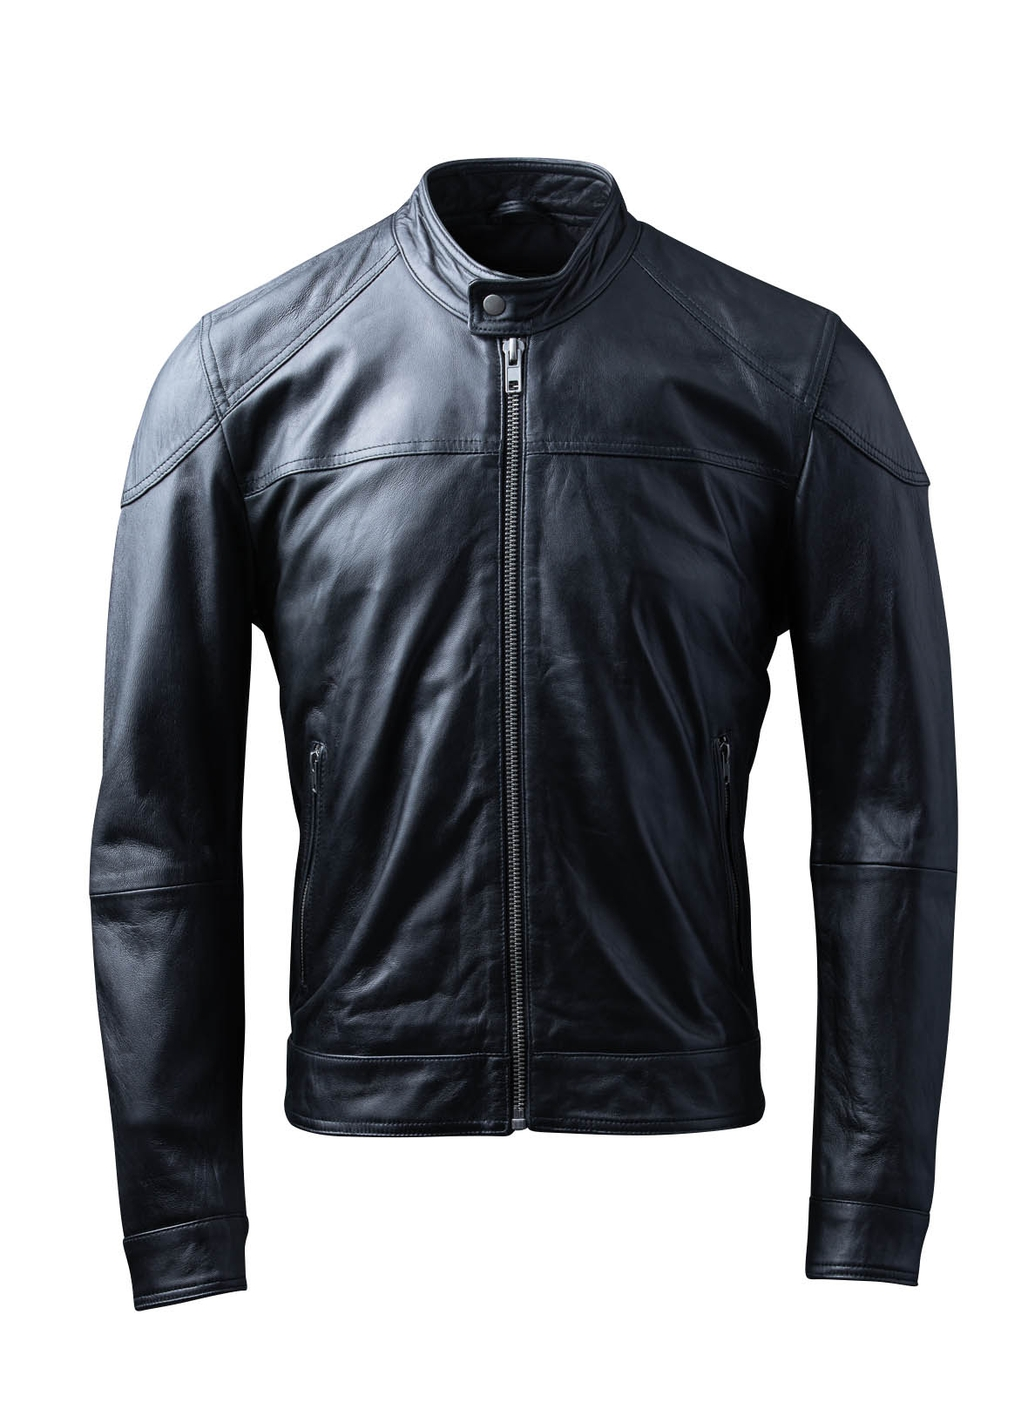 Carleton Leather Jacket in Black